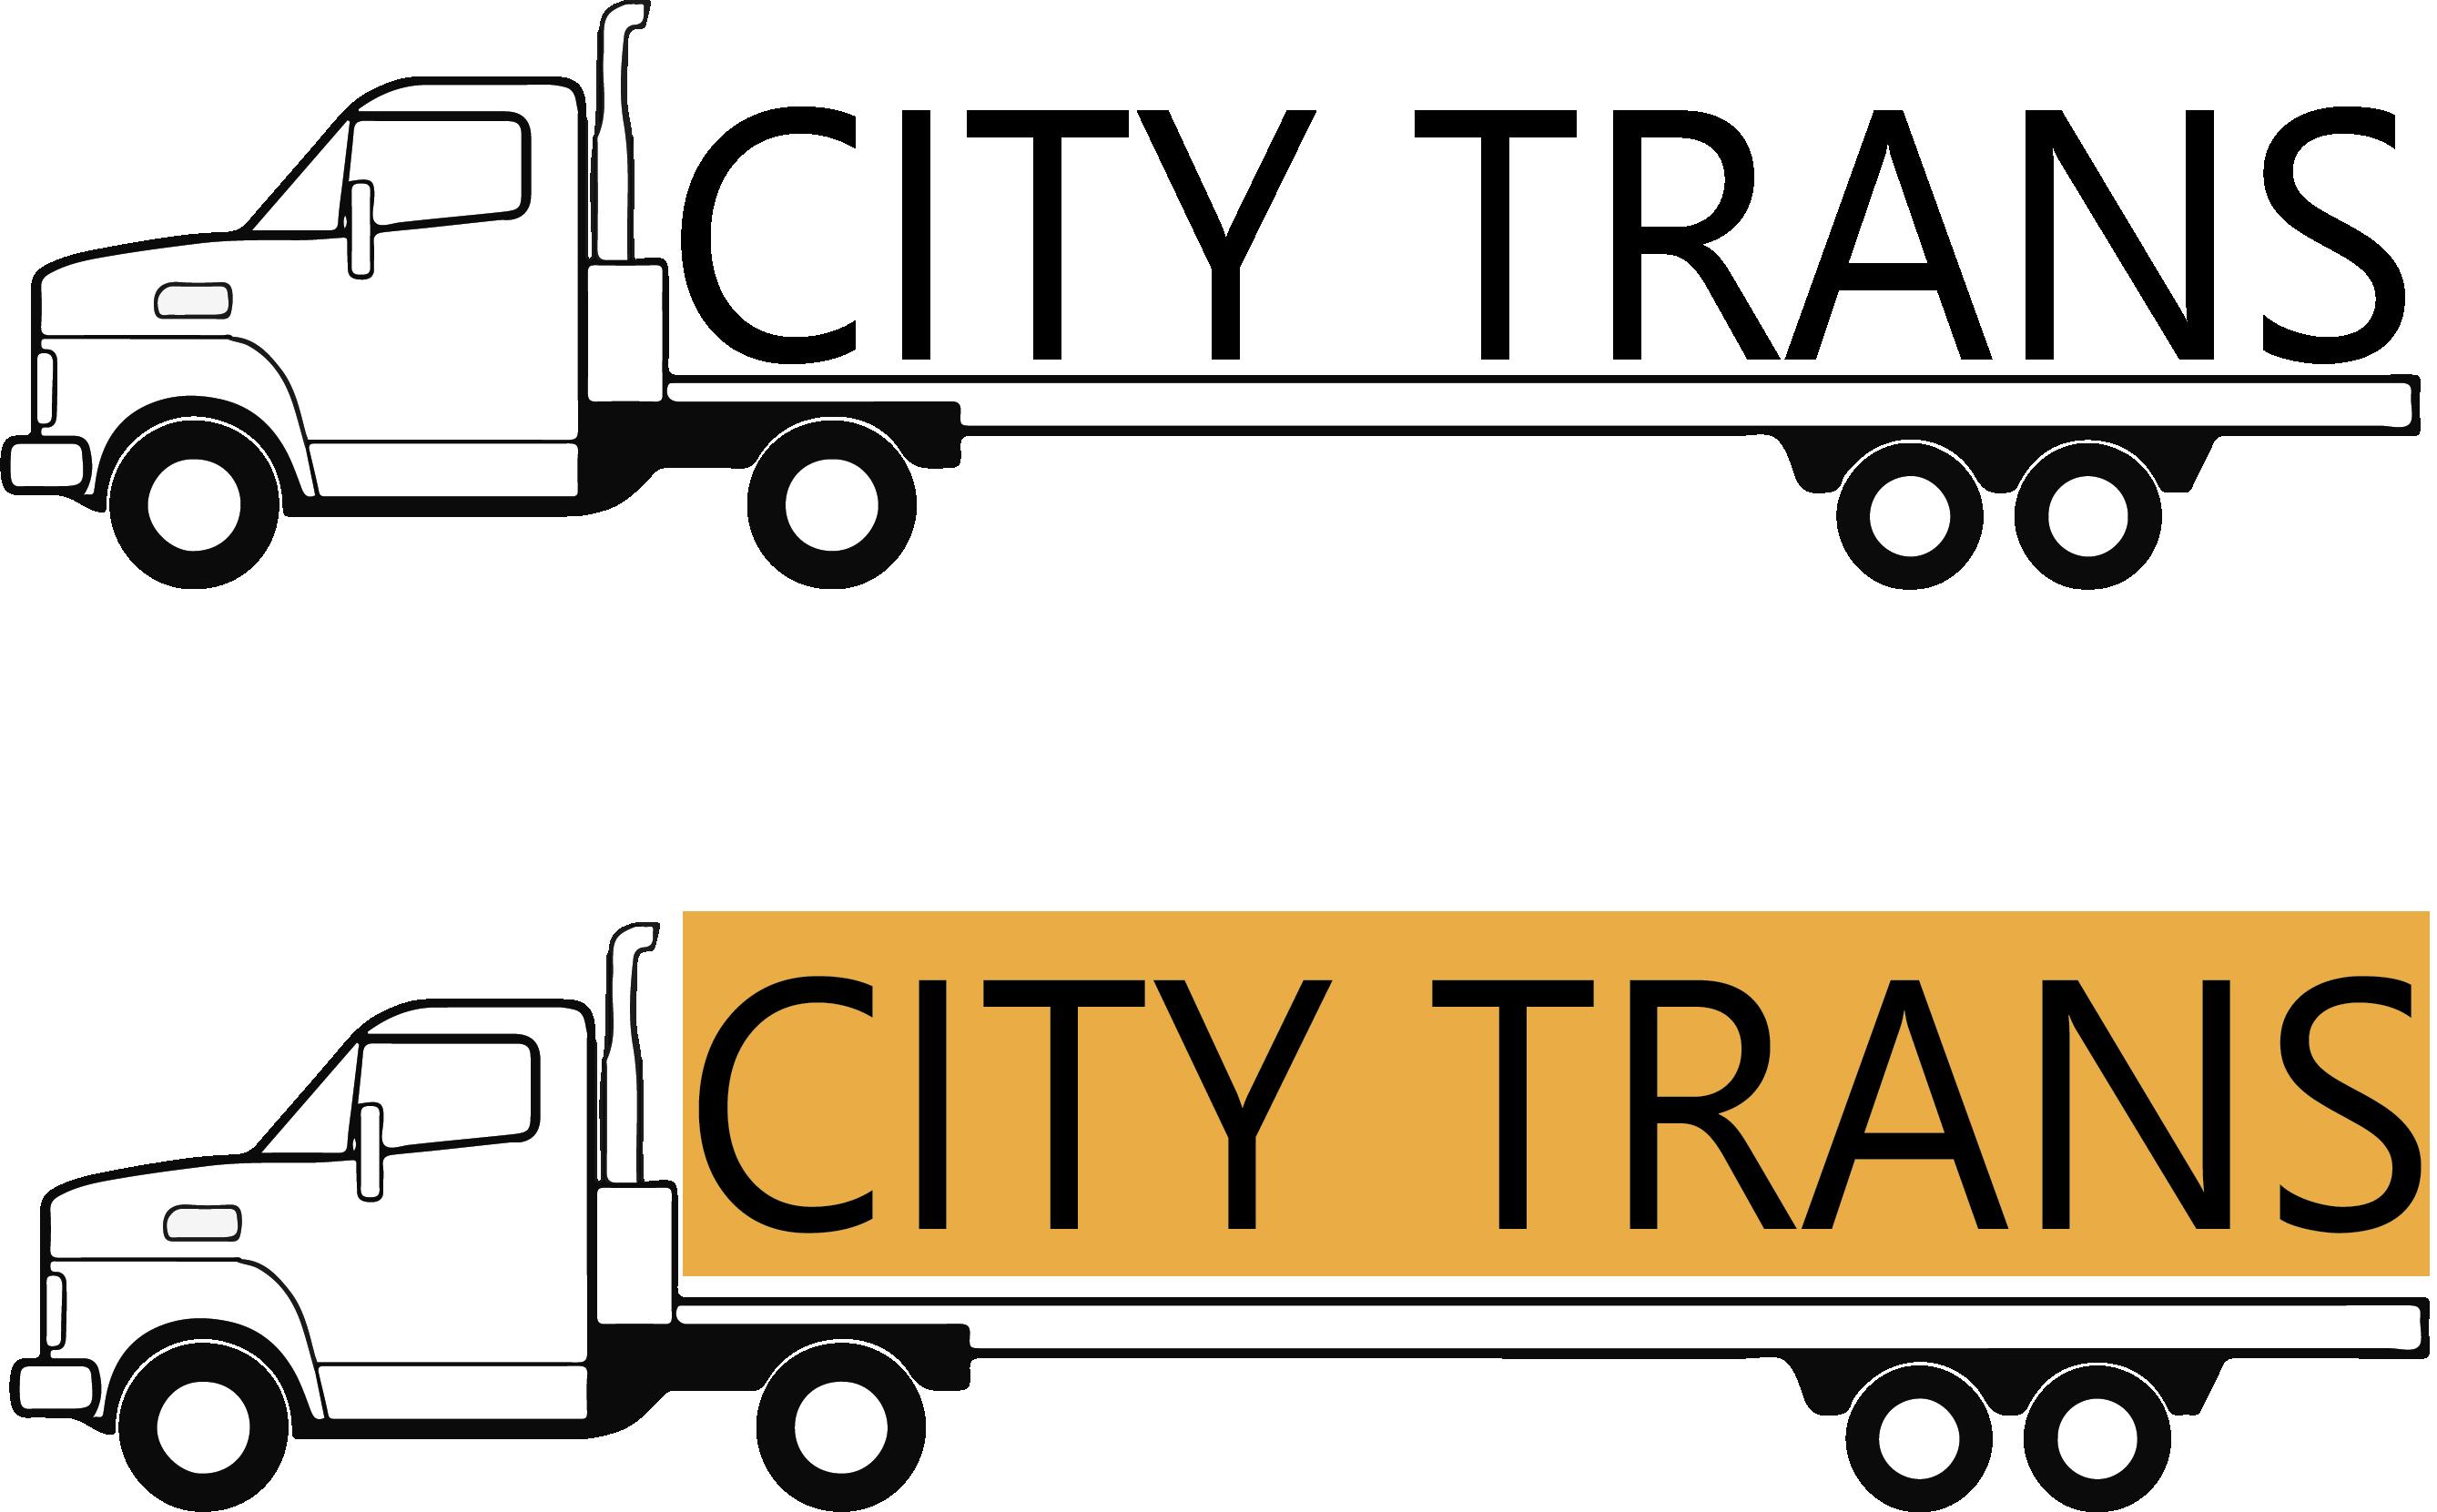 Разработка Логотипа транспортной компании фото f_5395e6d160bdbb1e.png